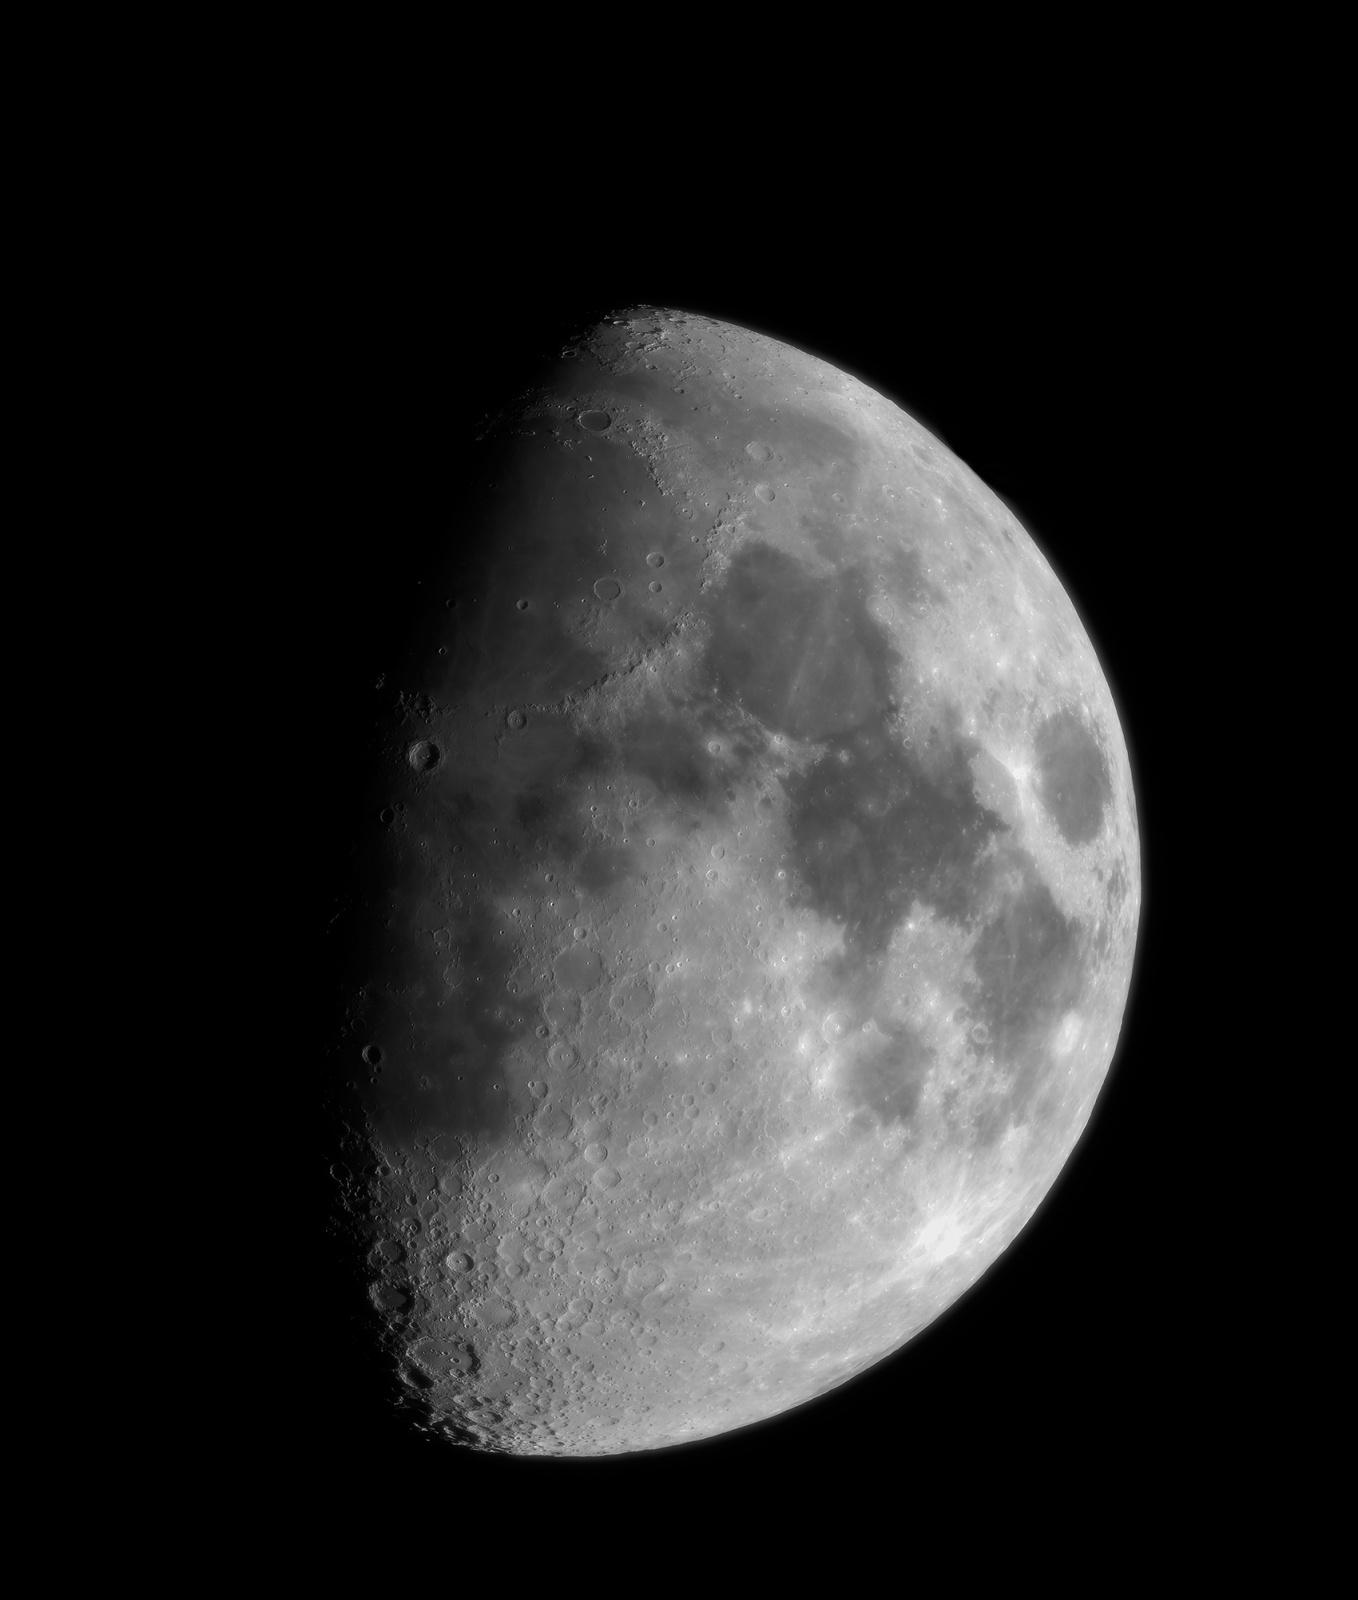 1435904851_Moon20210221ver4small.thumb.jpg.71f08ef8ca414ceac764f2f81e274cbc.jpg